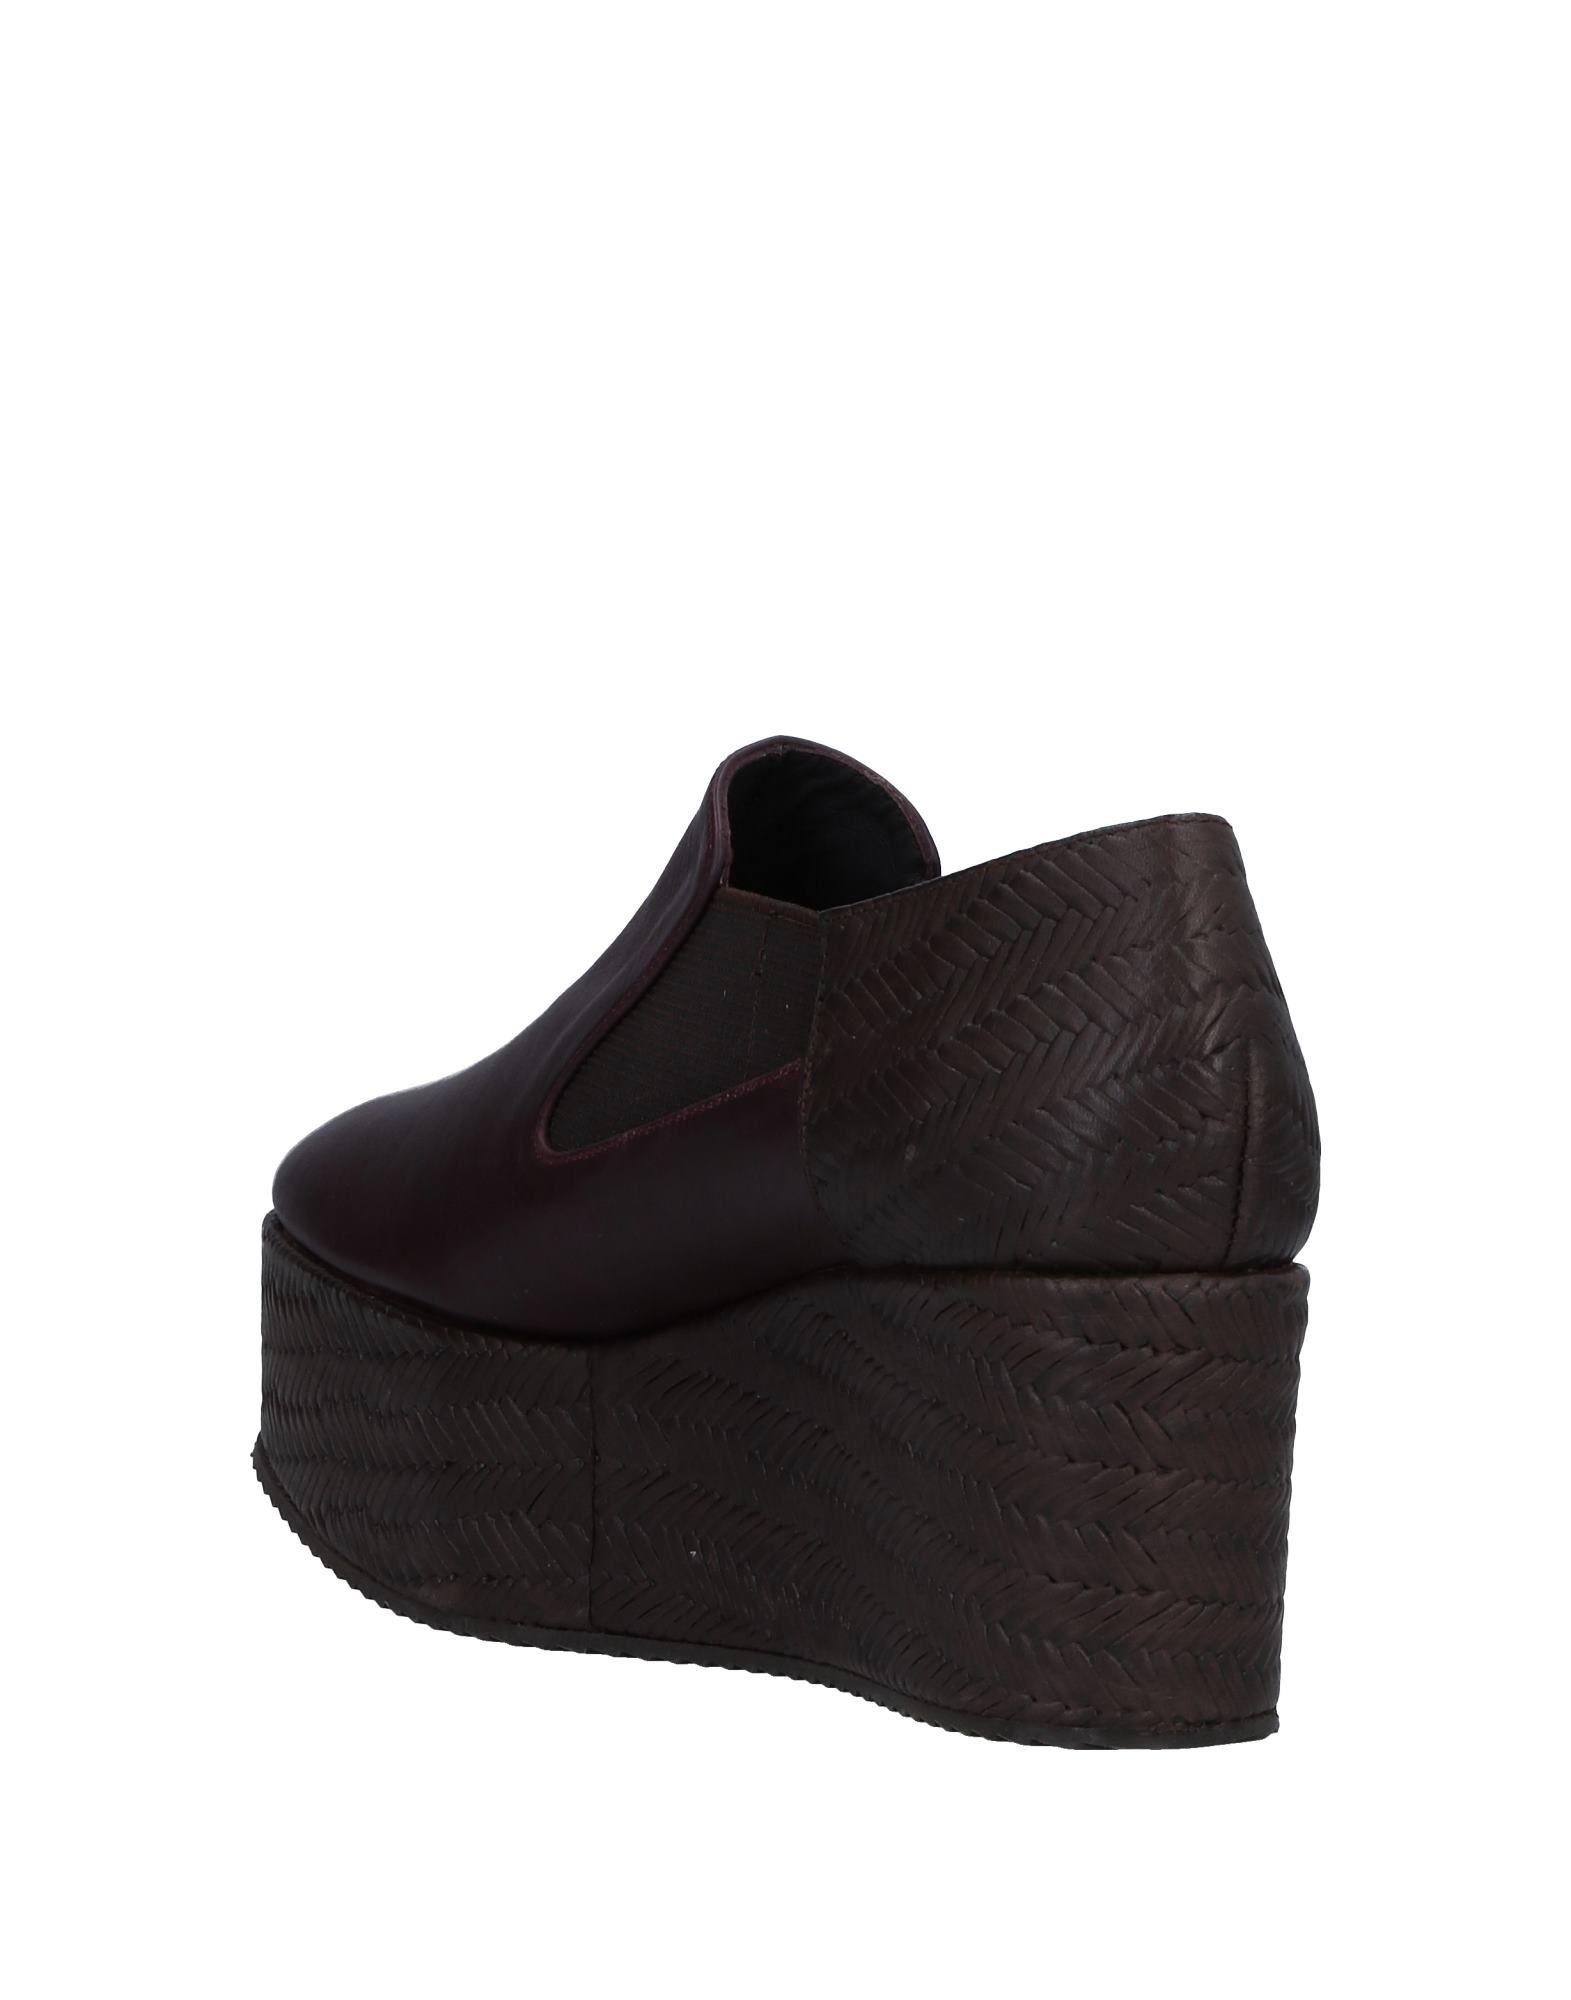 Stilvolle billige  Schuhe Castañer Mokassins Damen  billige 11537057NT 2dcc60